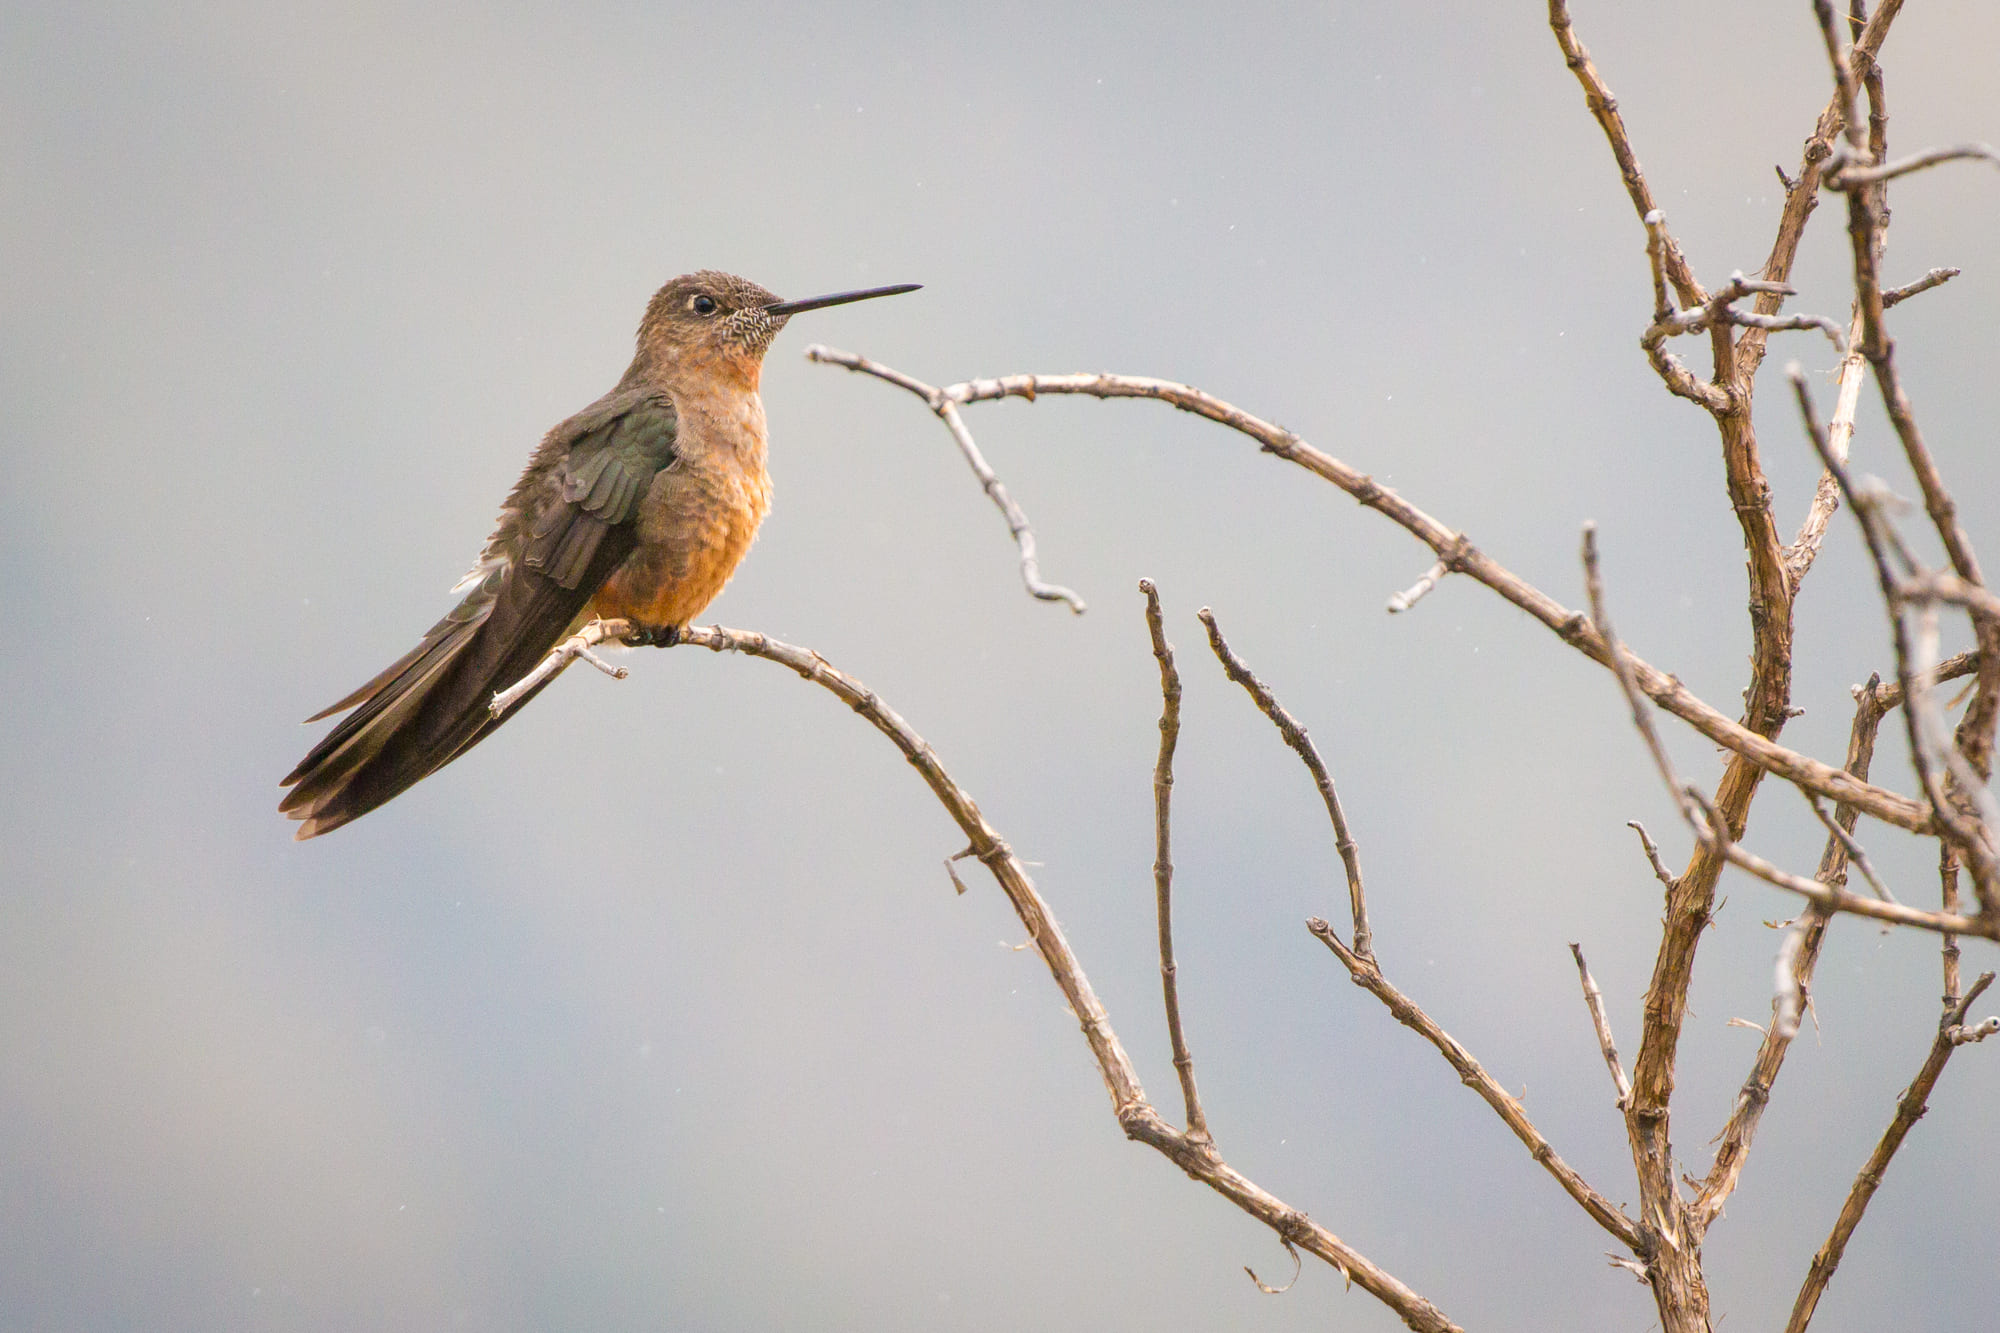 Giant Hummingbird in Ecuador.